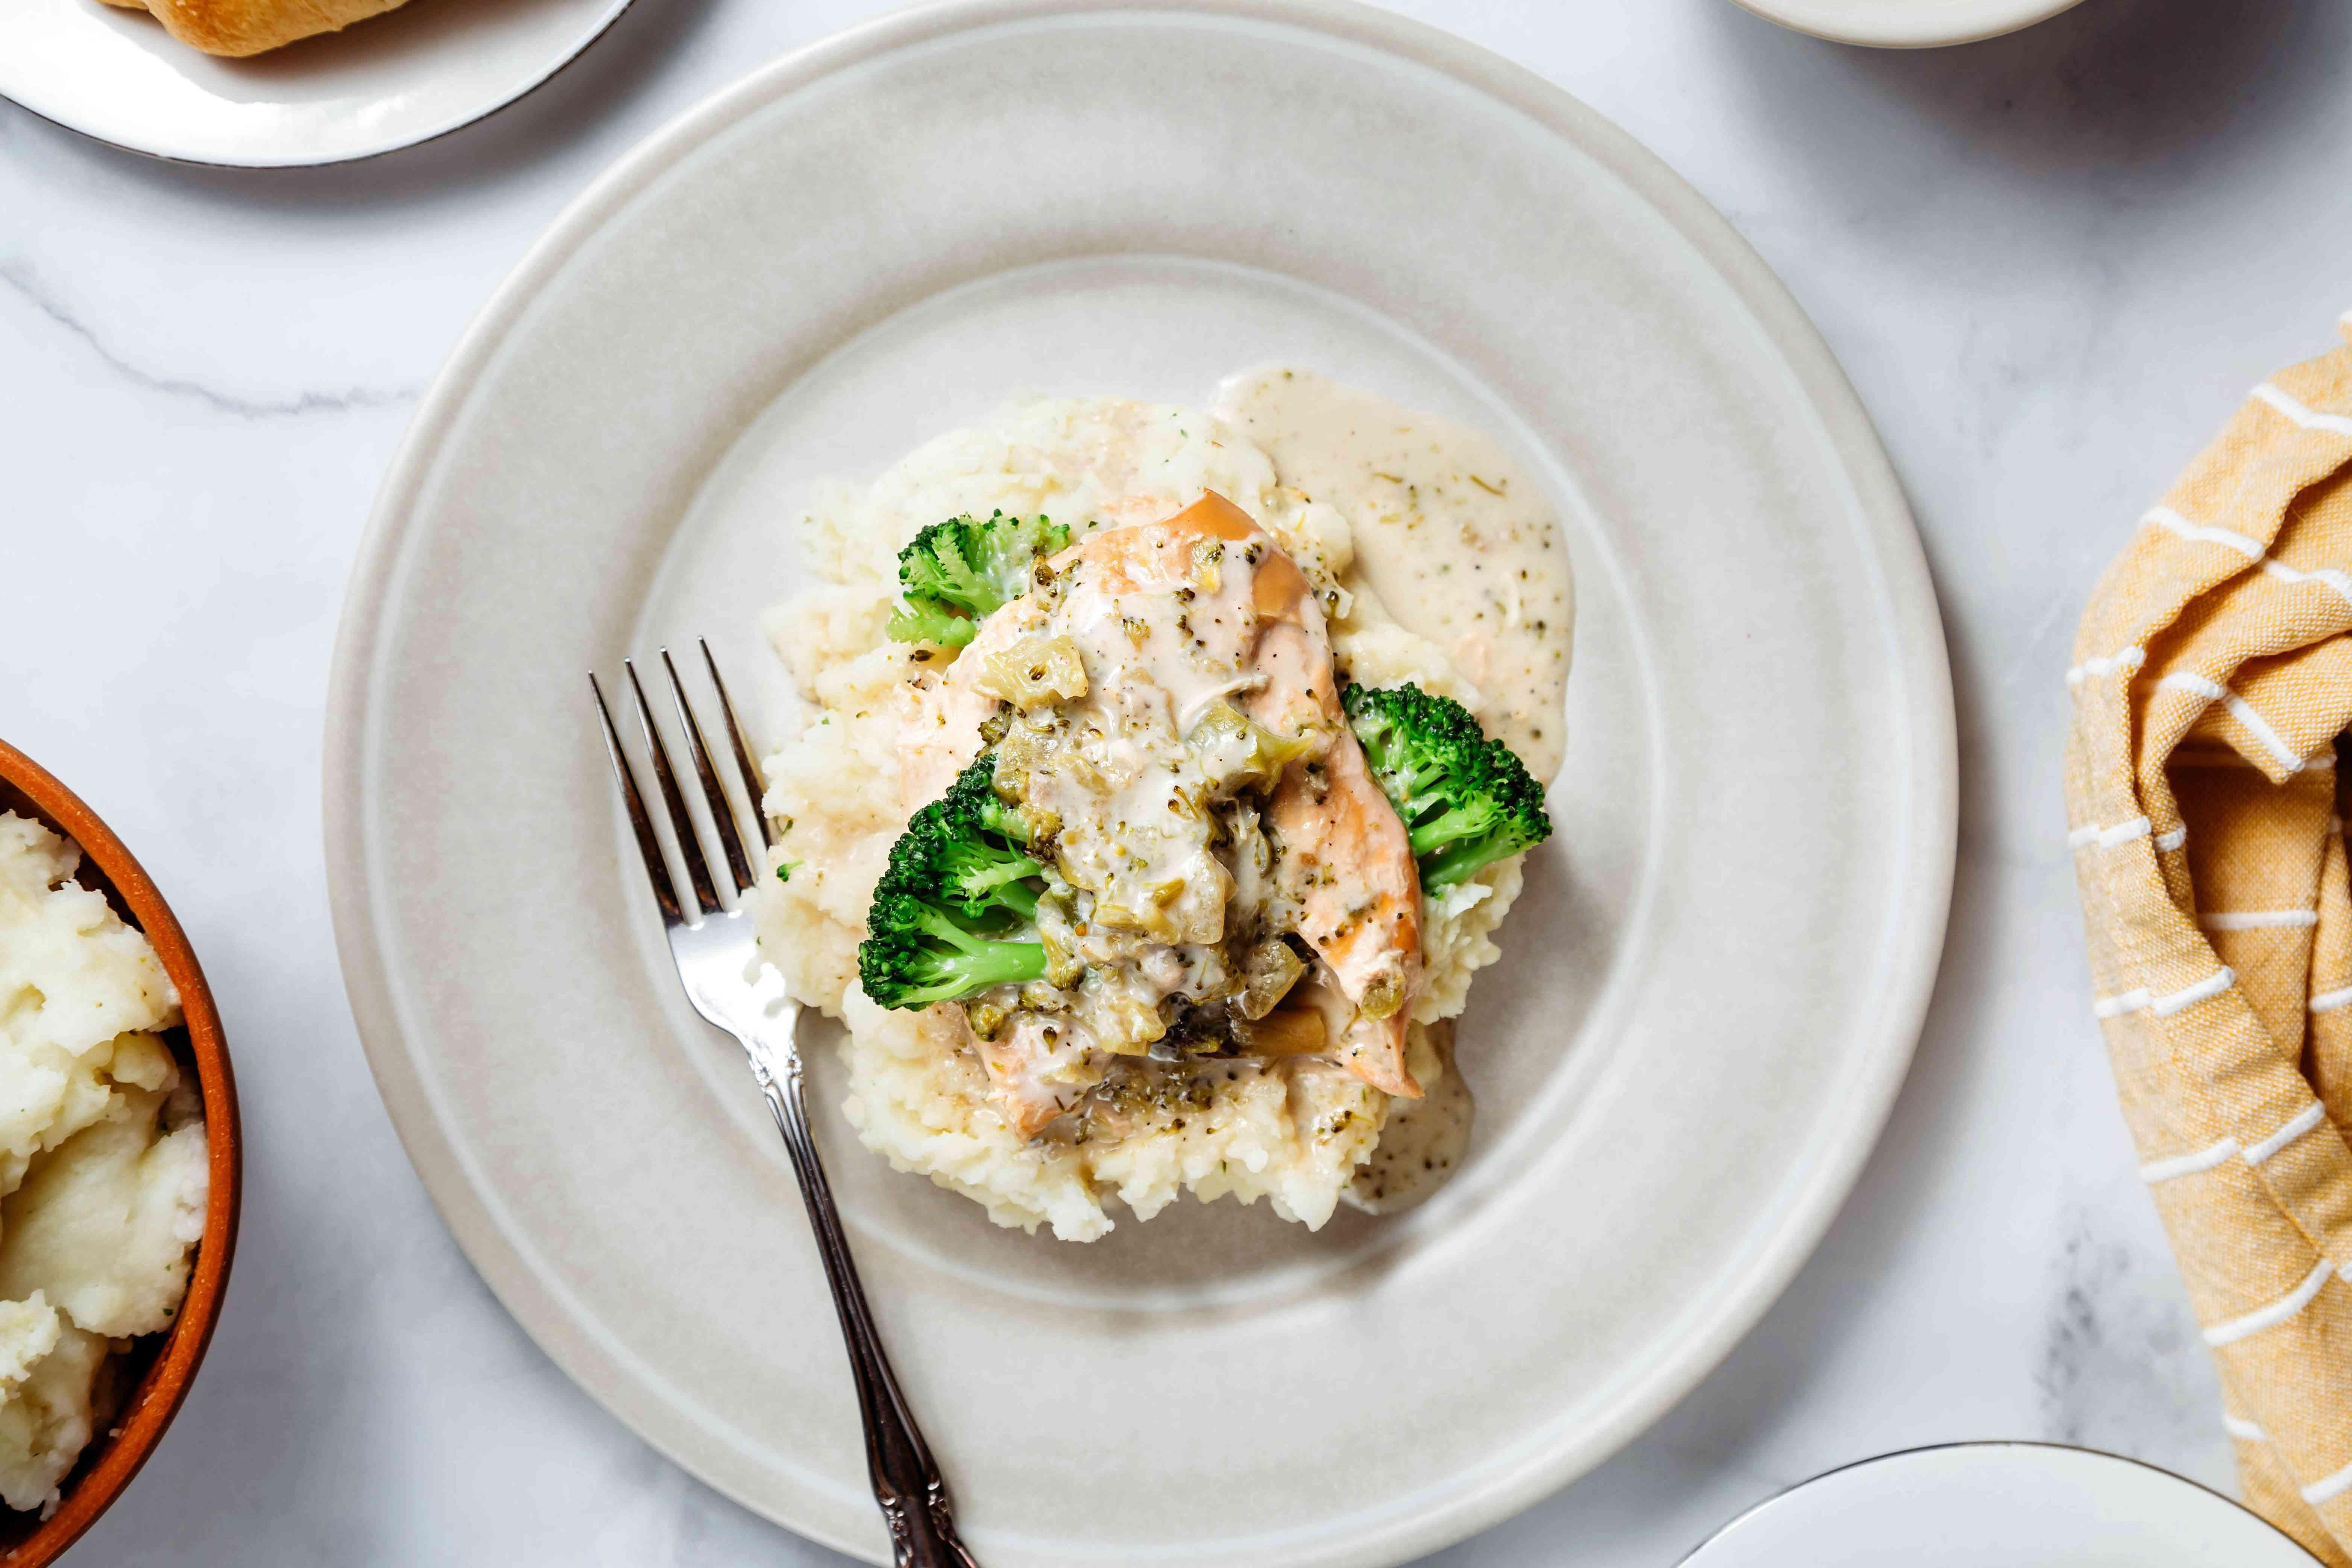 Creamy Broccoli Chicken